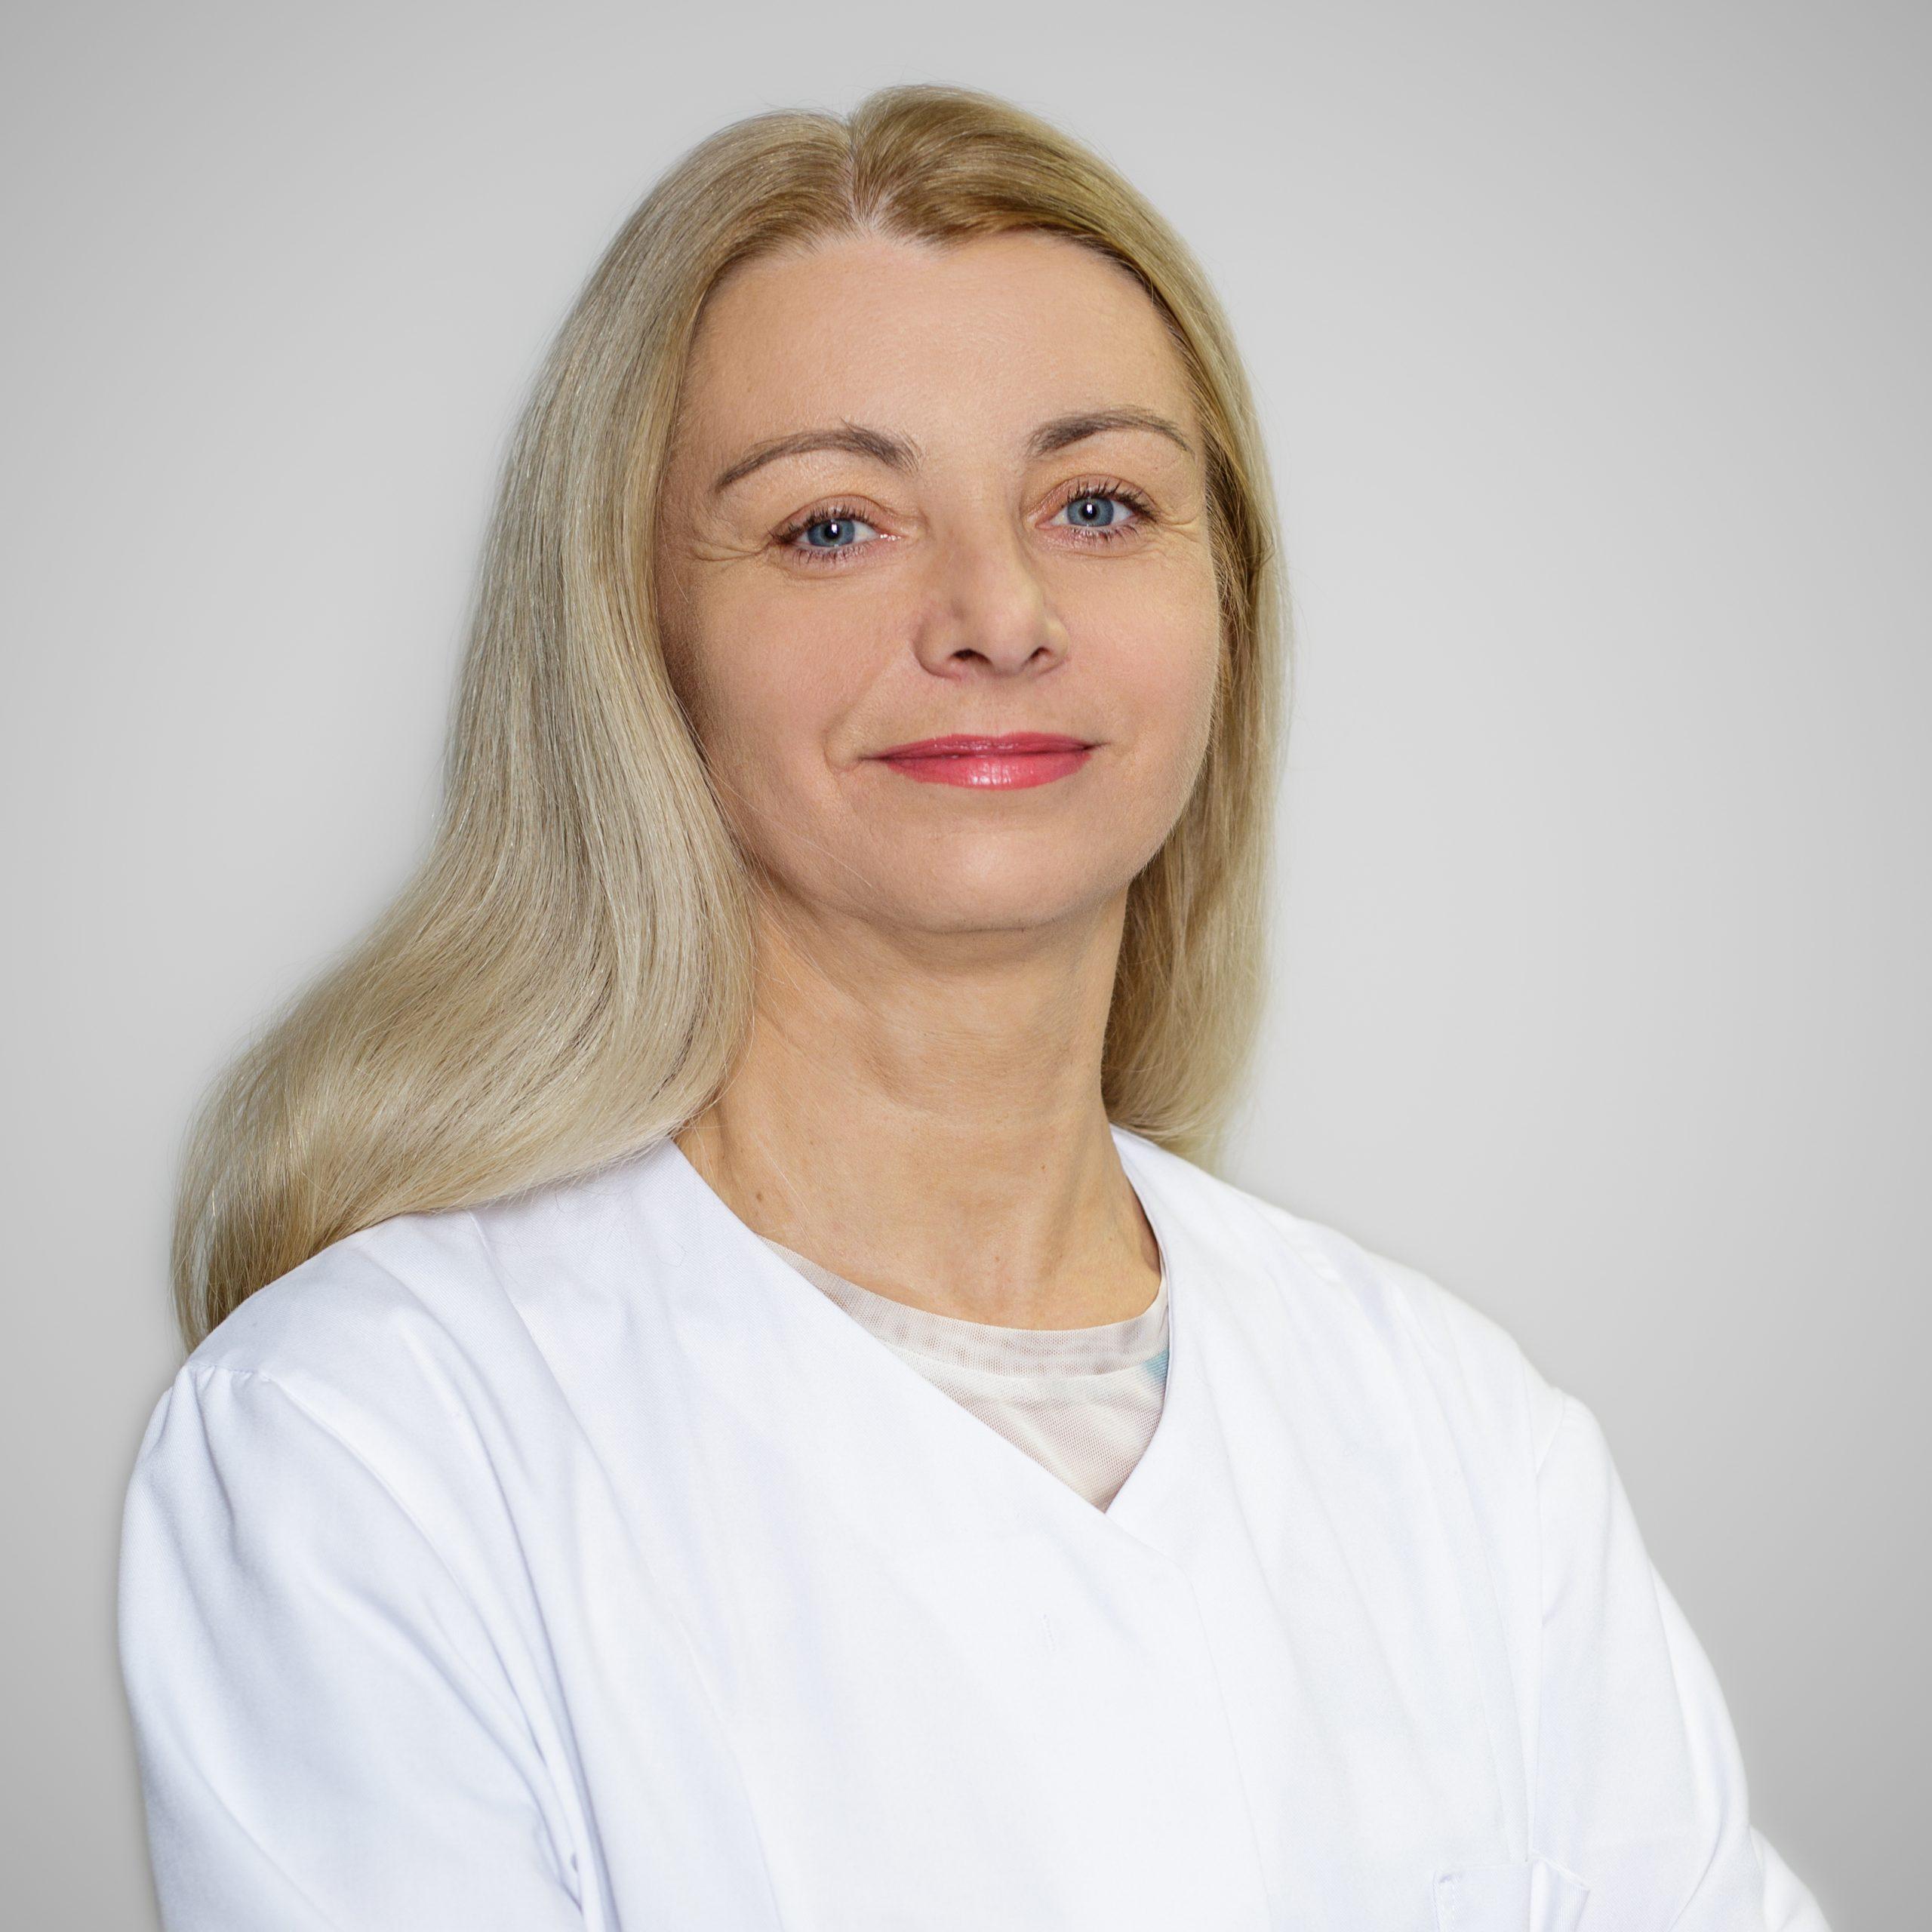 Eglė Karaliūtė